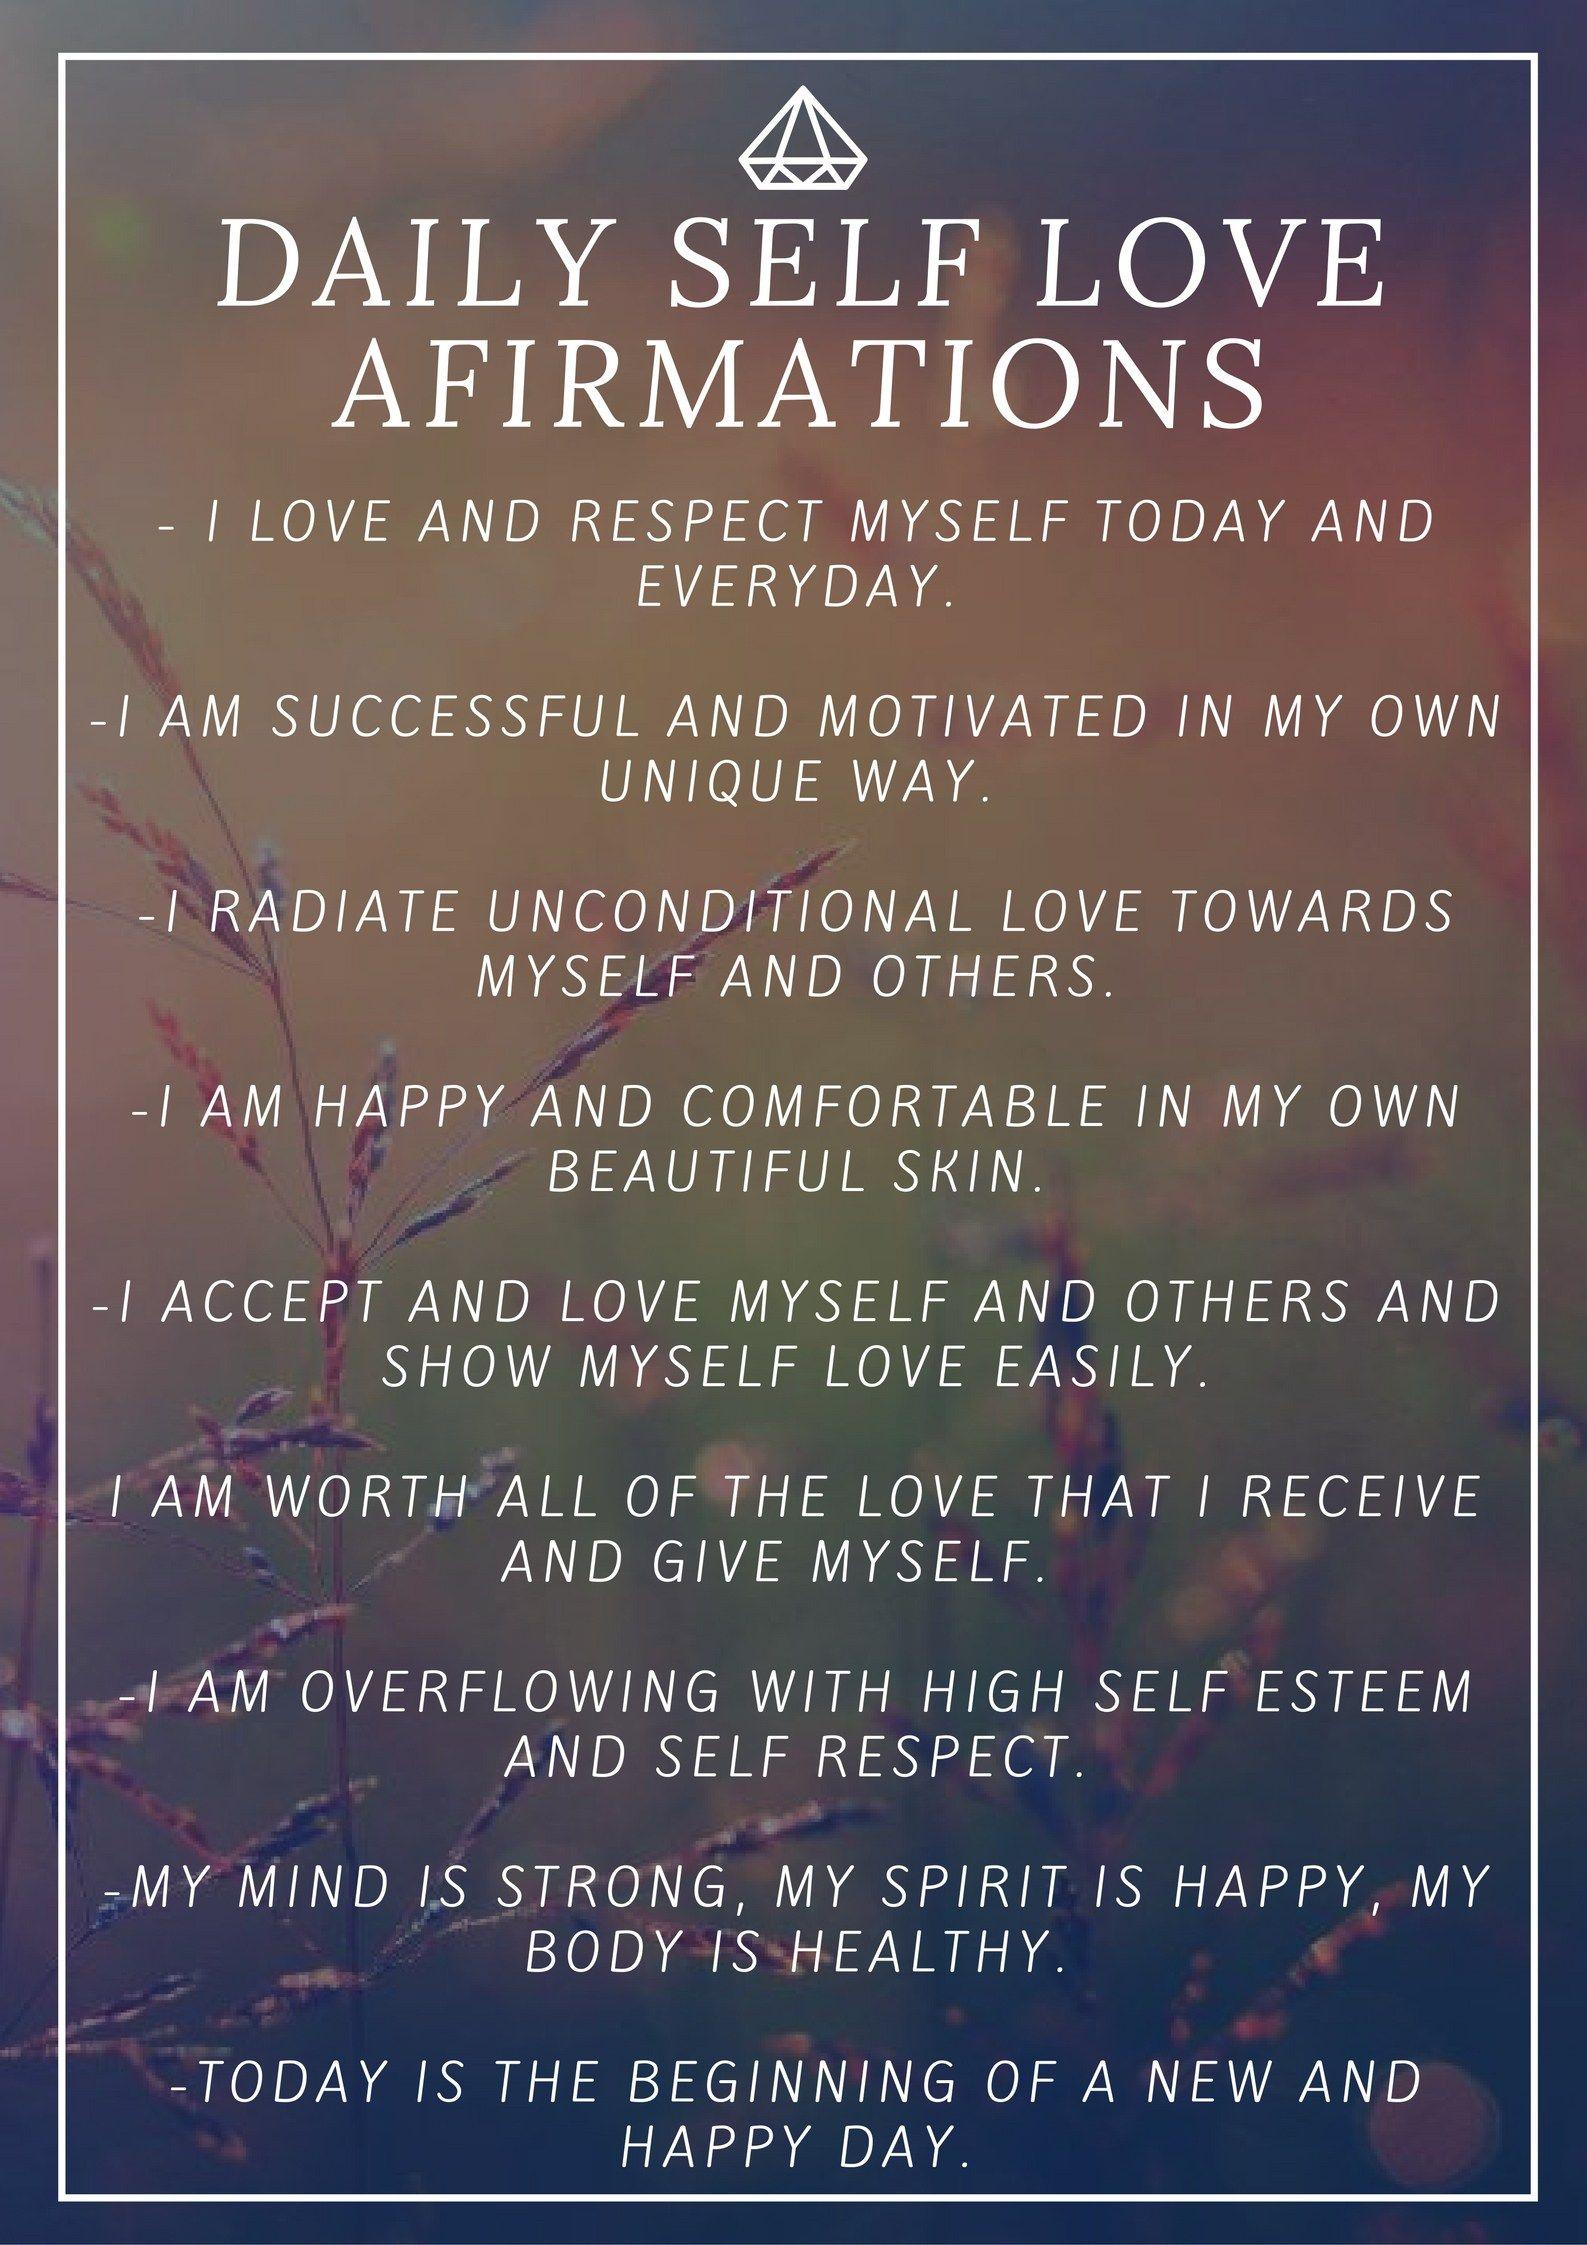 Your Fall Self Love List